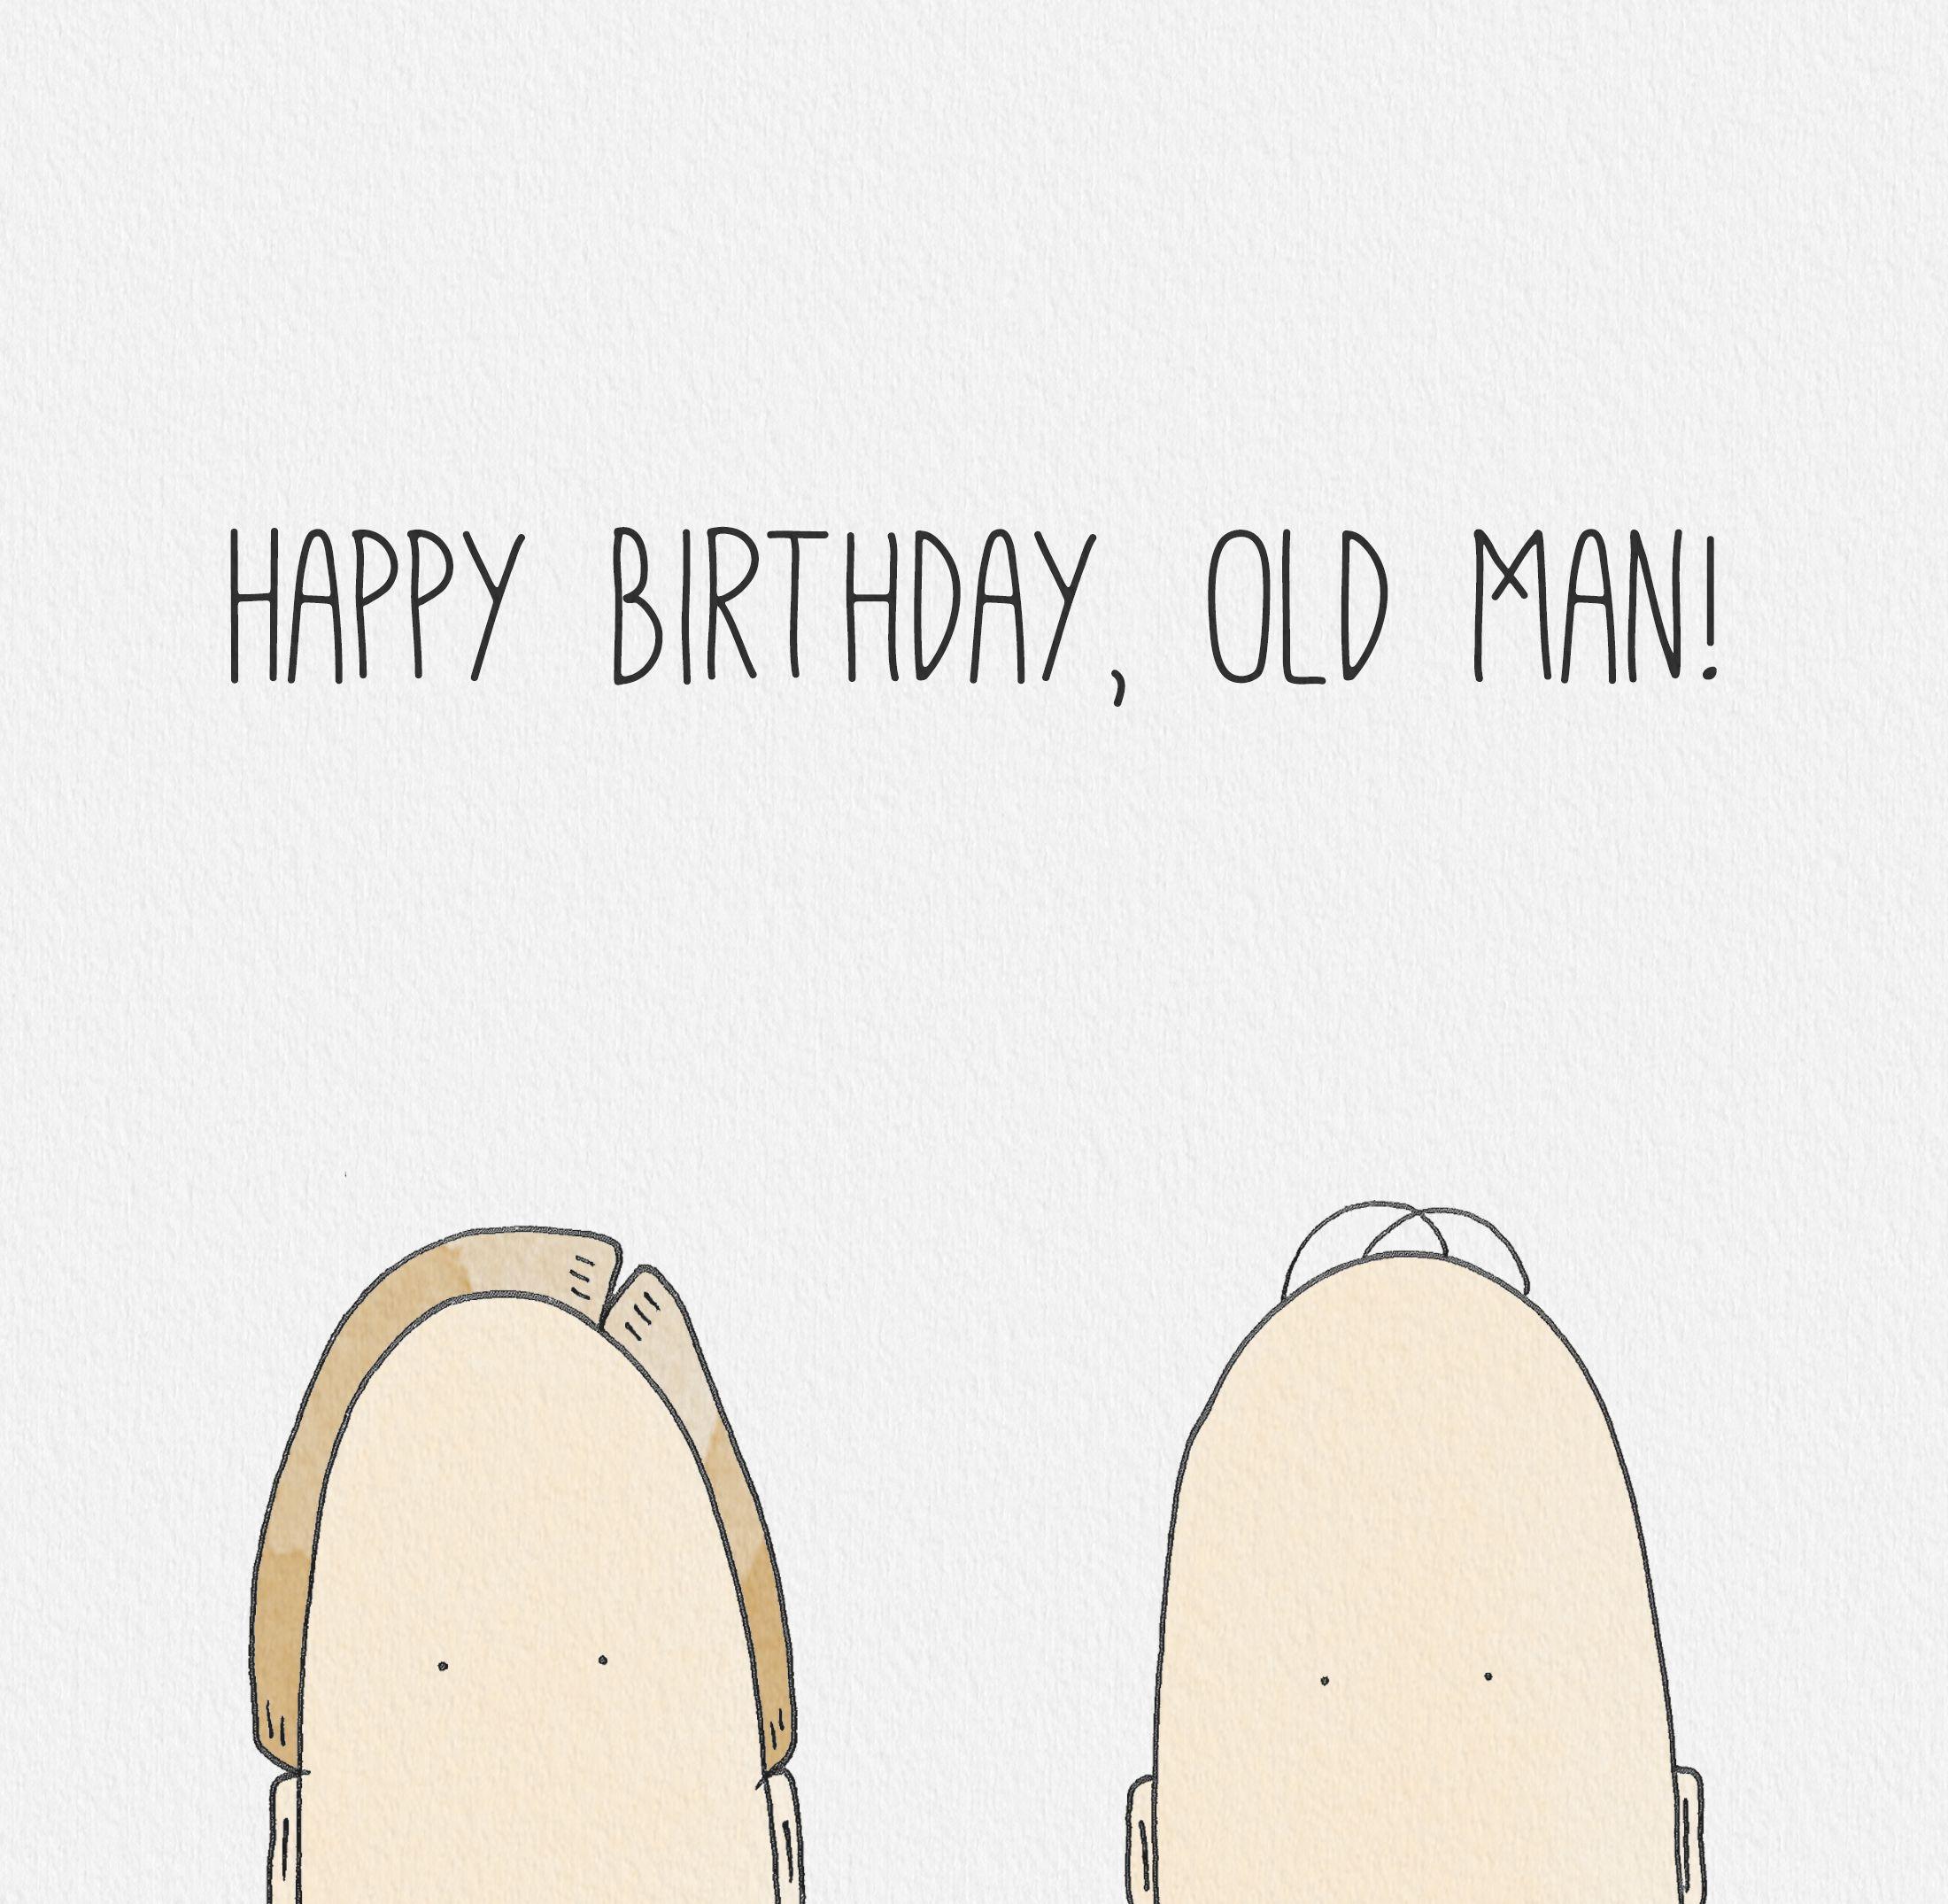 Old men love birthday cards oldman